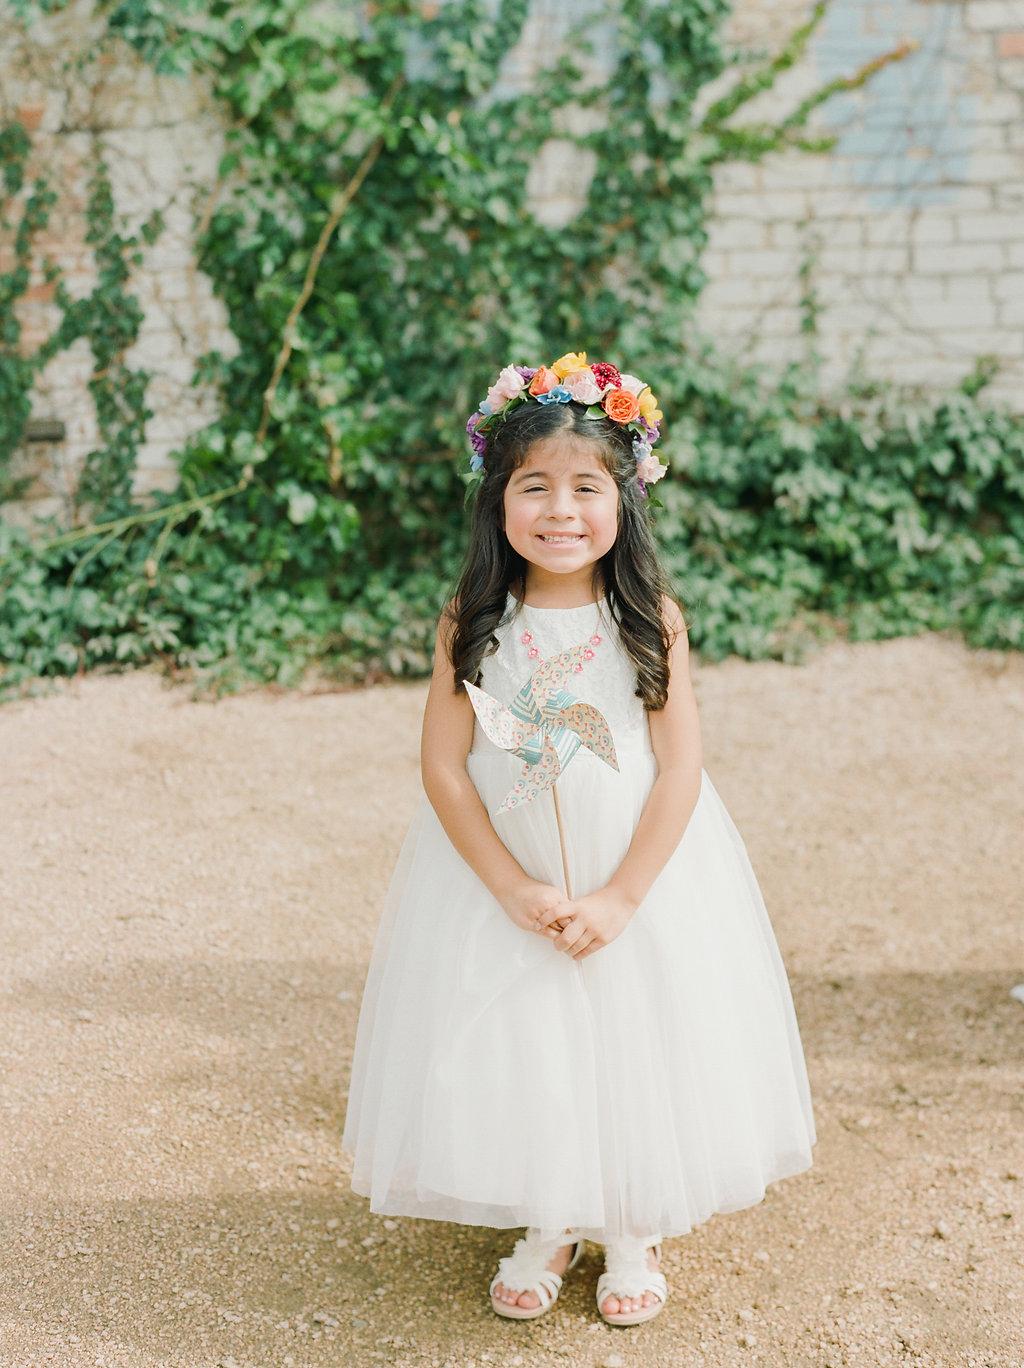 cute flower girl ideas - https://ruffledblog.com/modern-playful-texas-carnival-wedding